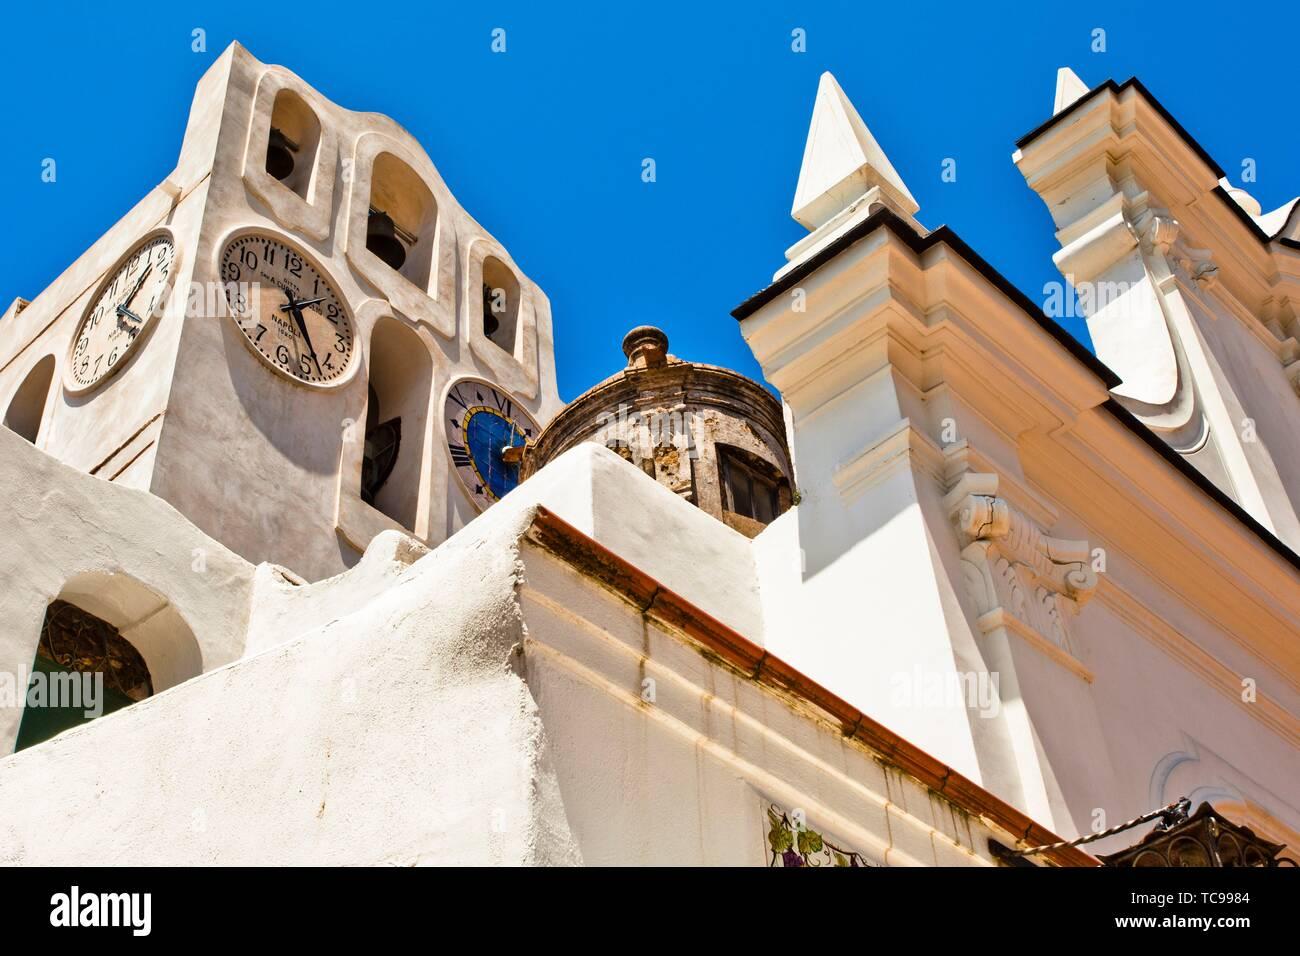 Chiesa di Santa Sofia, Santa Sofia Church, Anacapri, Capri island, Campania region, Tyrrhenian Sea, Italy, Europe. Stock Photo